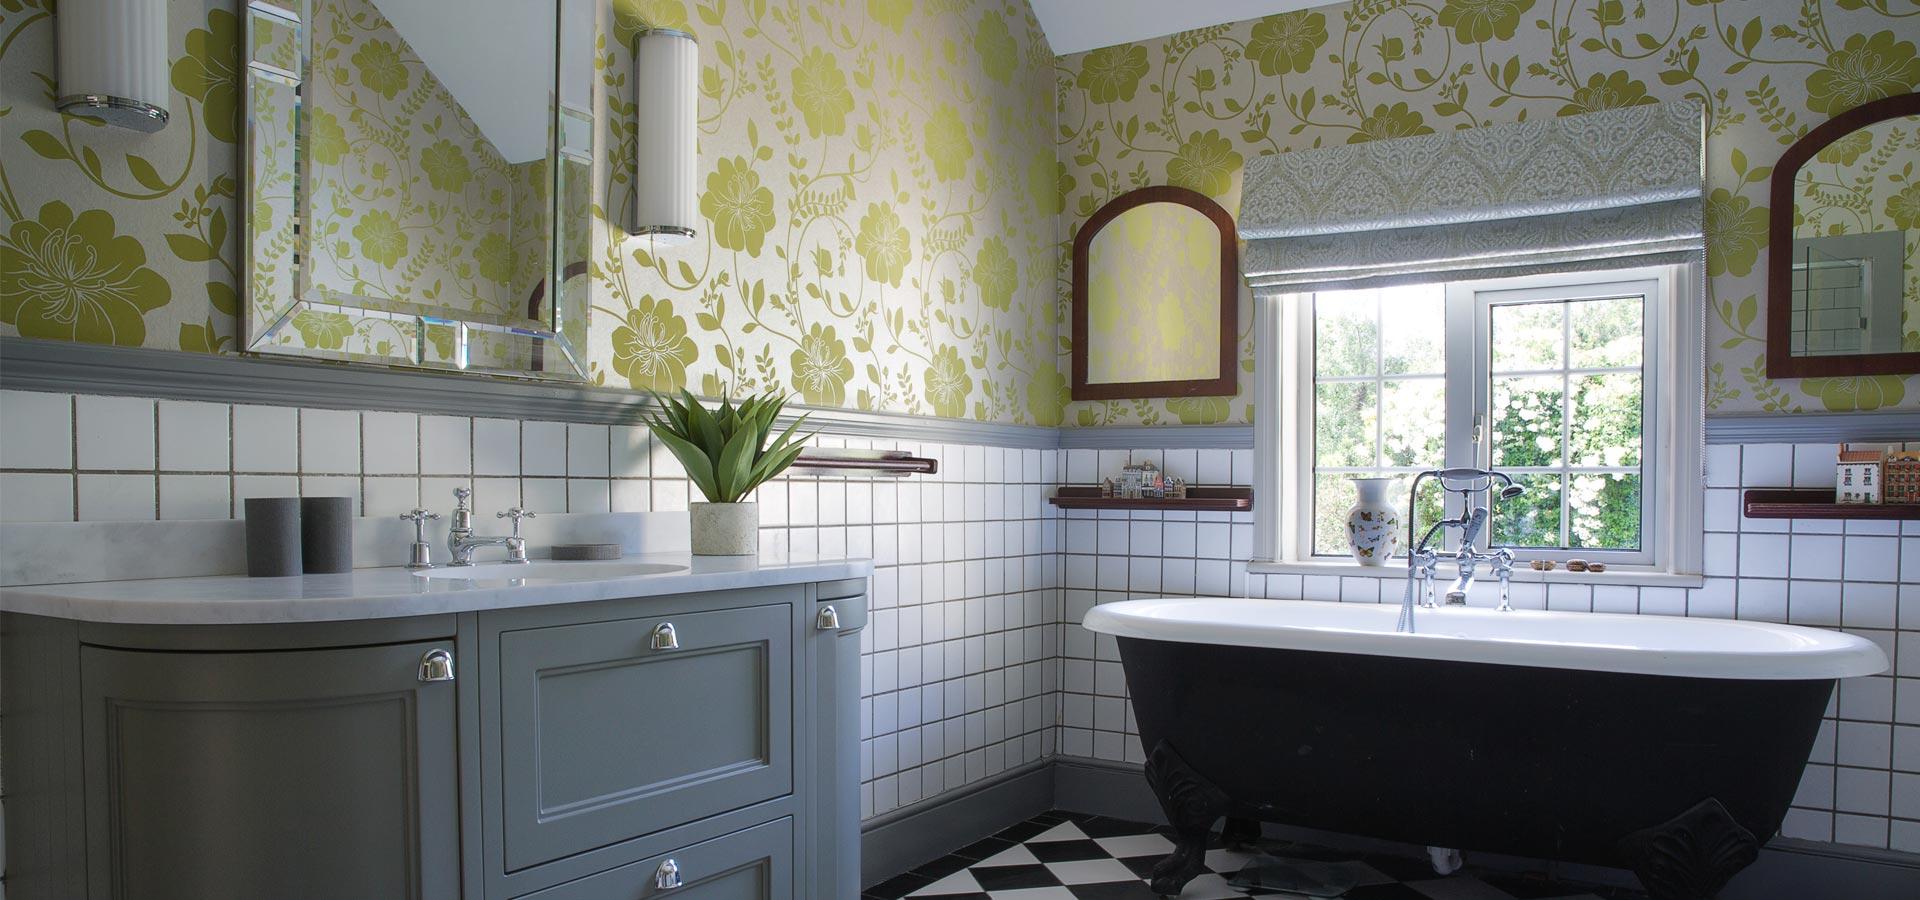 decorated bathroom